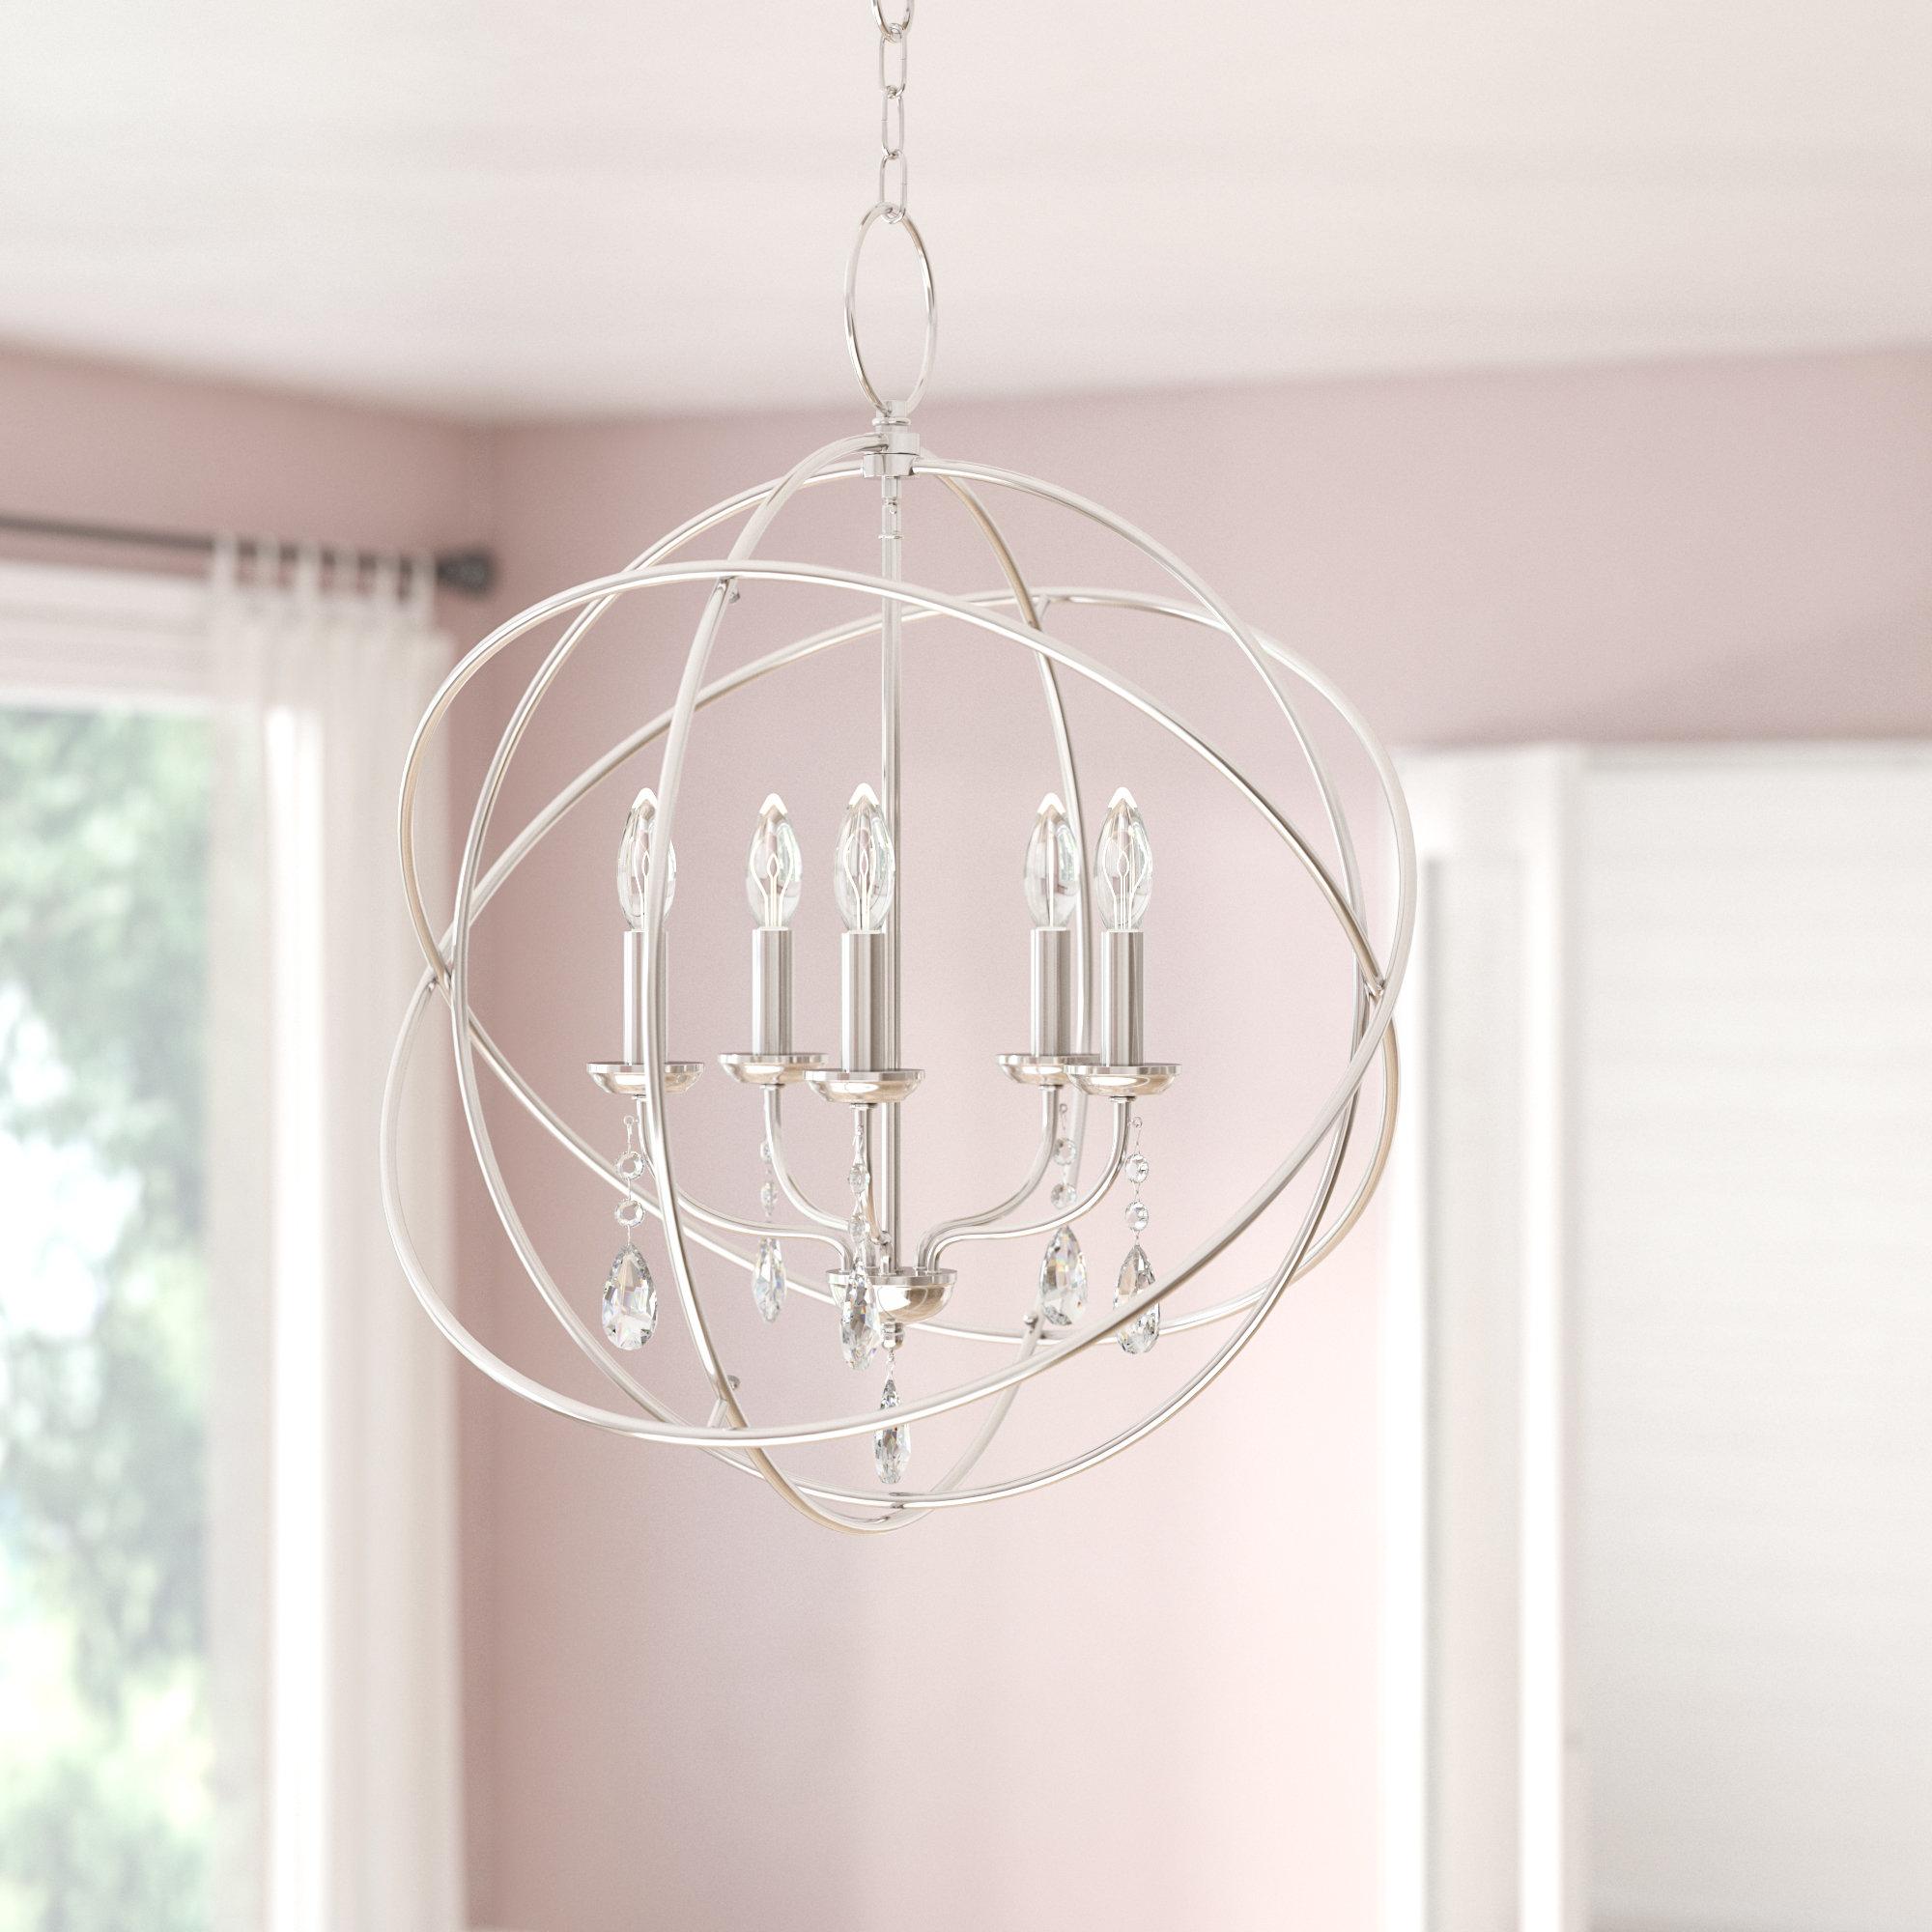 Auberta 5 Light Globe Chandelier With Popular Verlene Foyer 5 Light Globe Chandeliers (View 1 of 25)